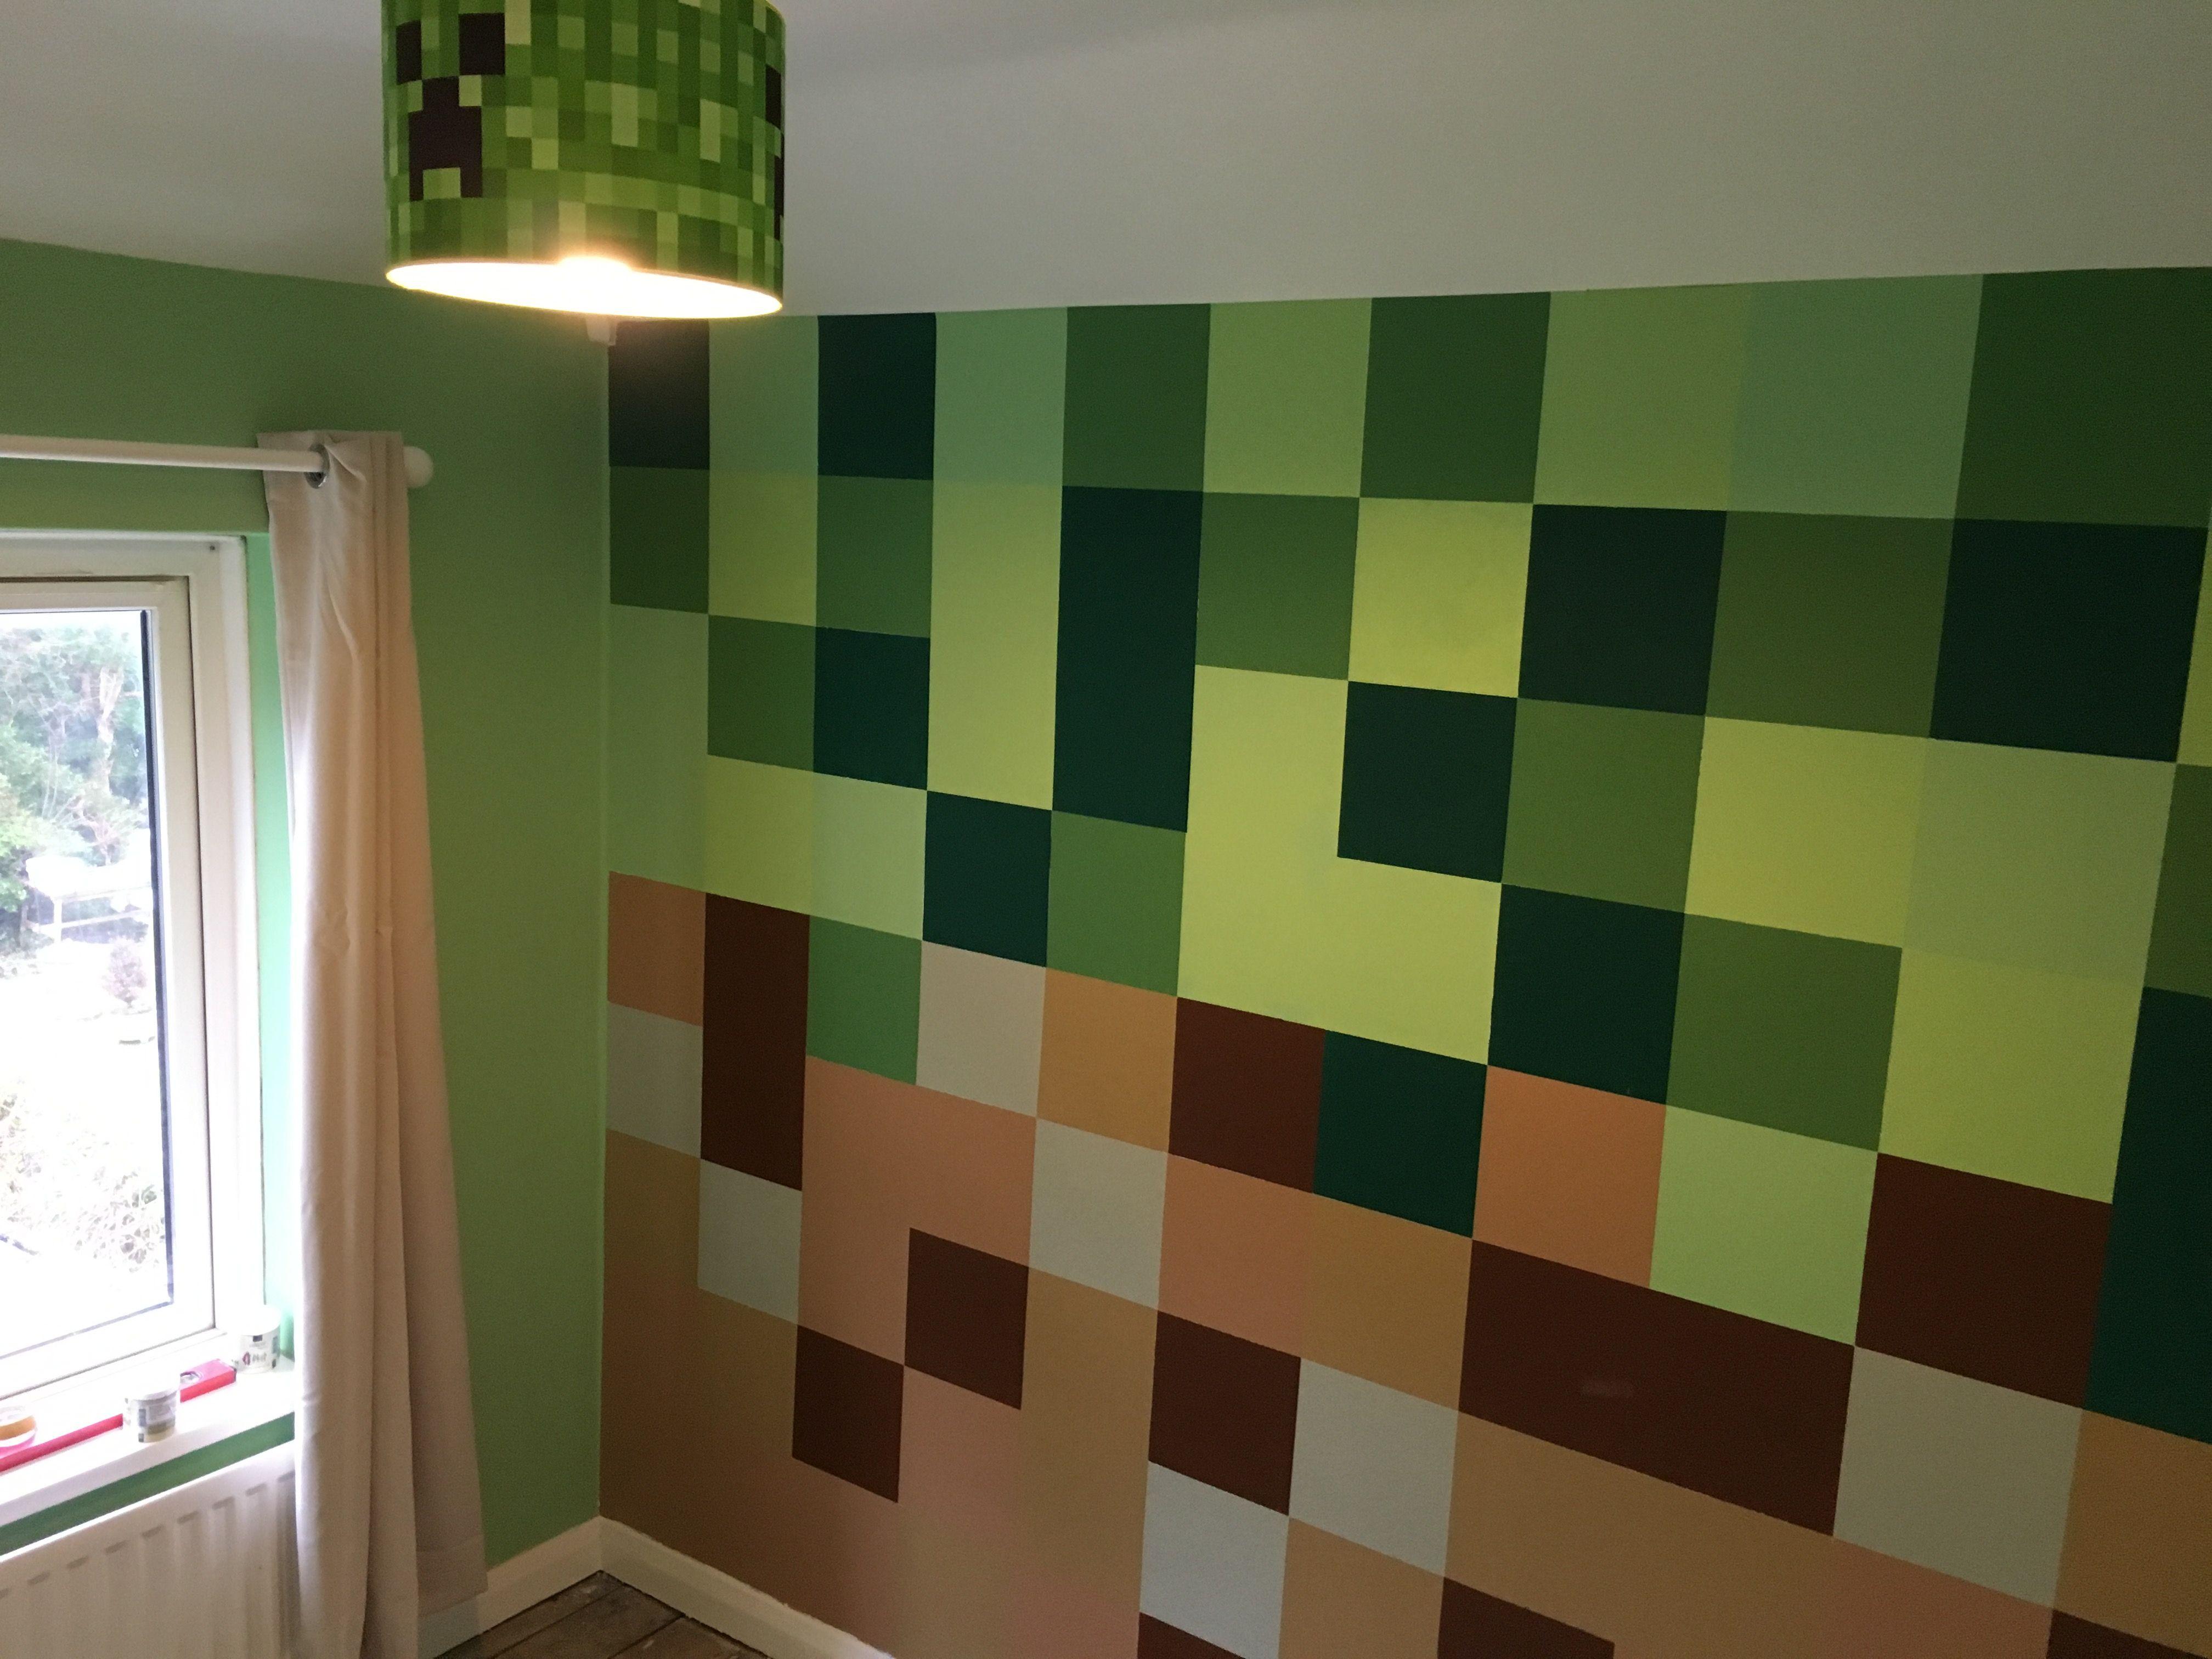 fun images minecraft bedroom wallpaper border